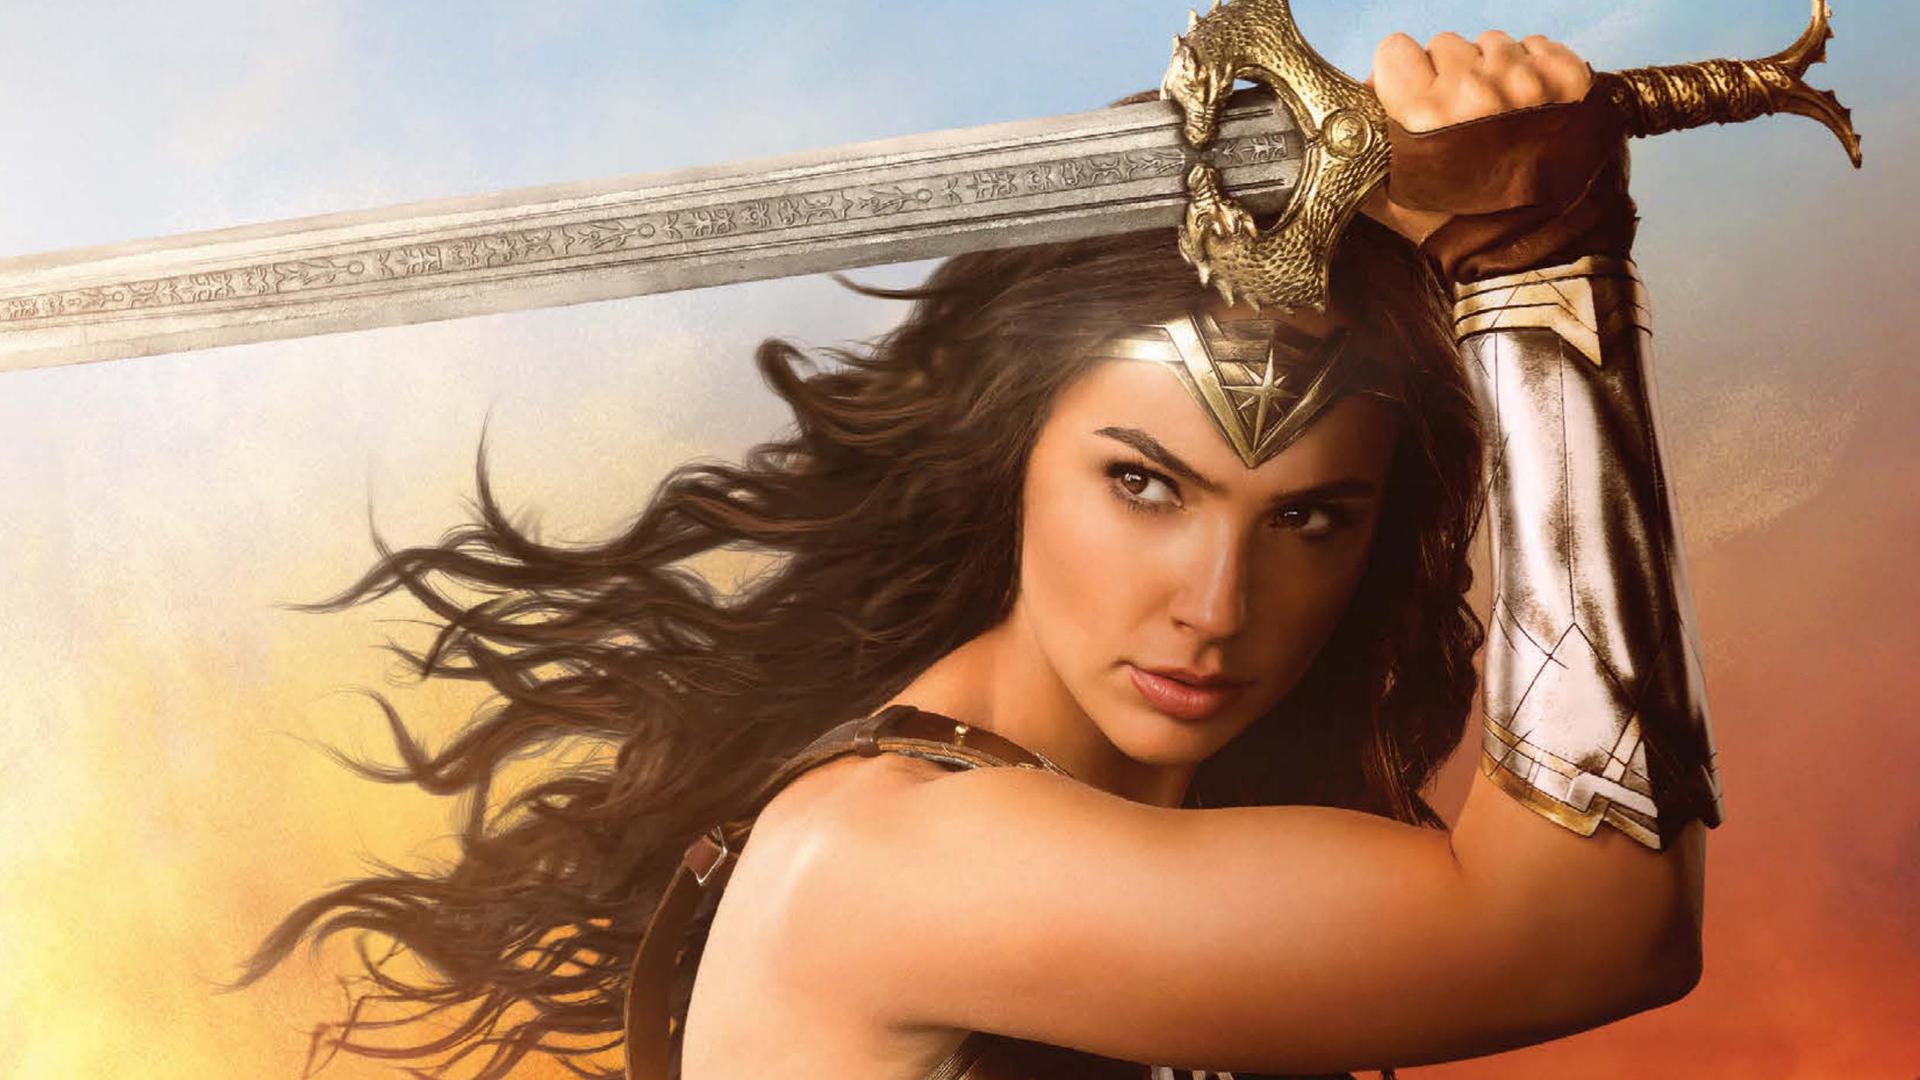 Wallpaper Gal Gadot Wonder Woman 2017 Movies Hd Movies: 1920x1080 Wonder Woman Cover Laptop Full HD 1080P HD 4k